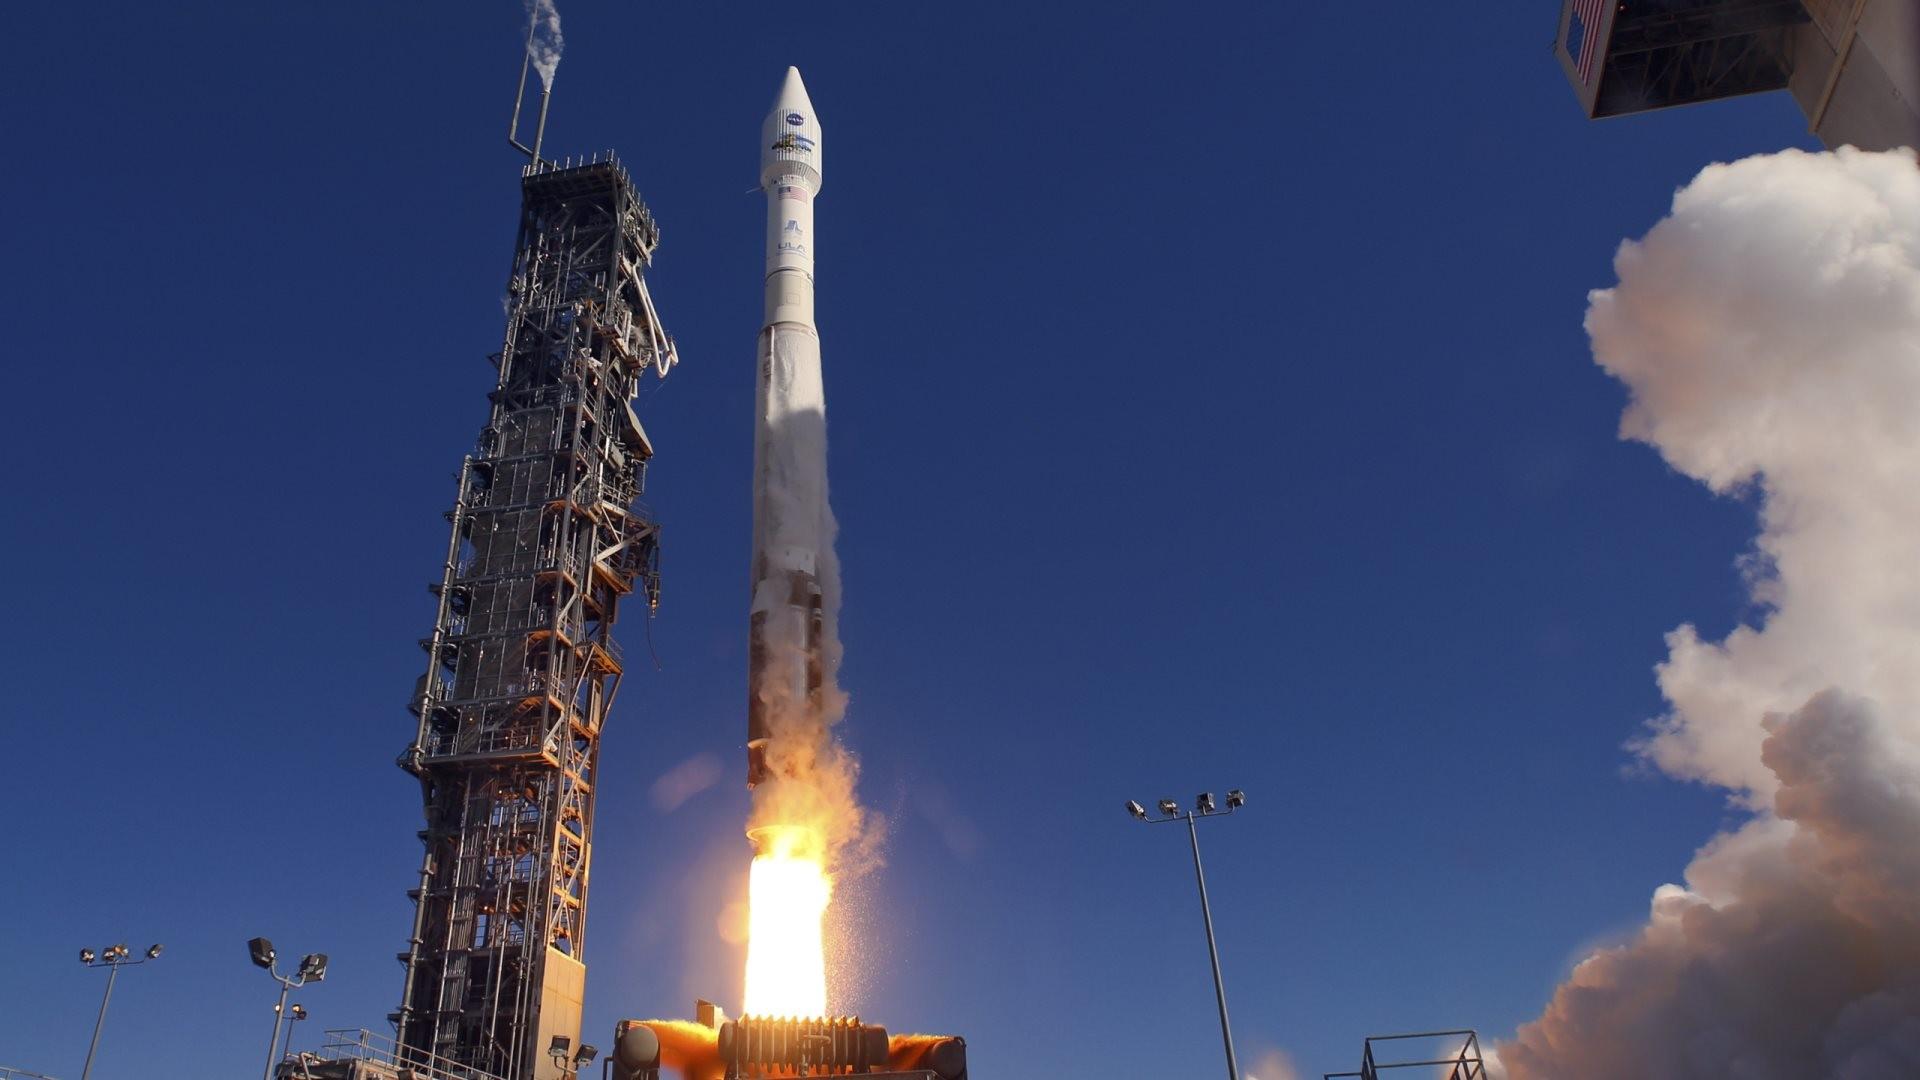 Wallpaper: NASA Launch Landsat. High Definition HD 1920×1080